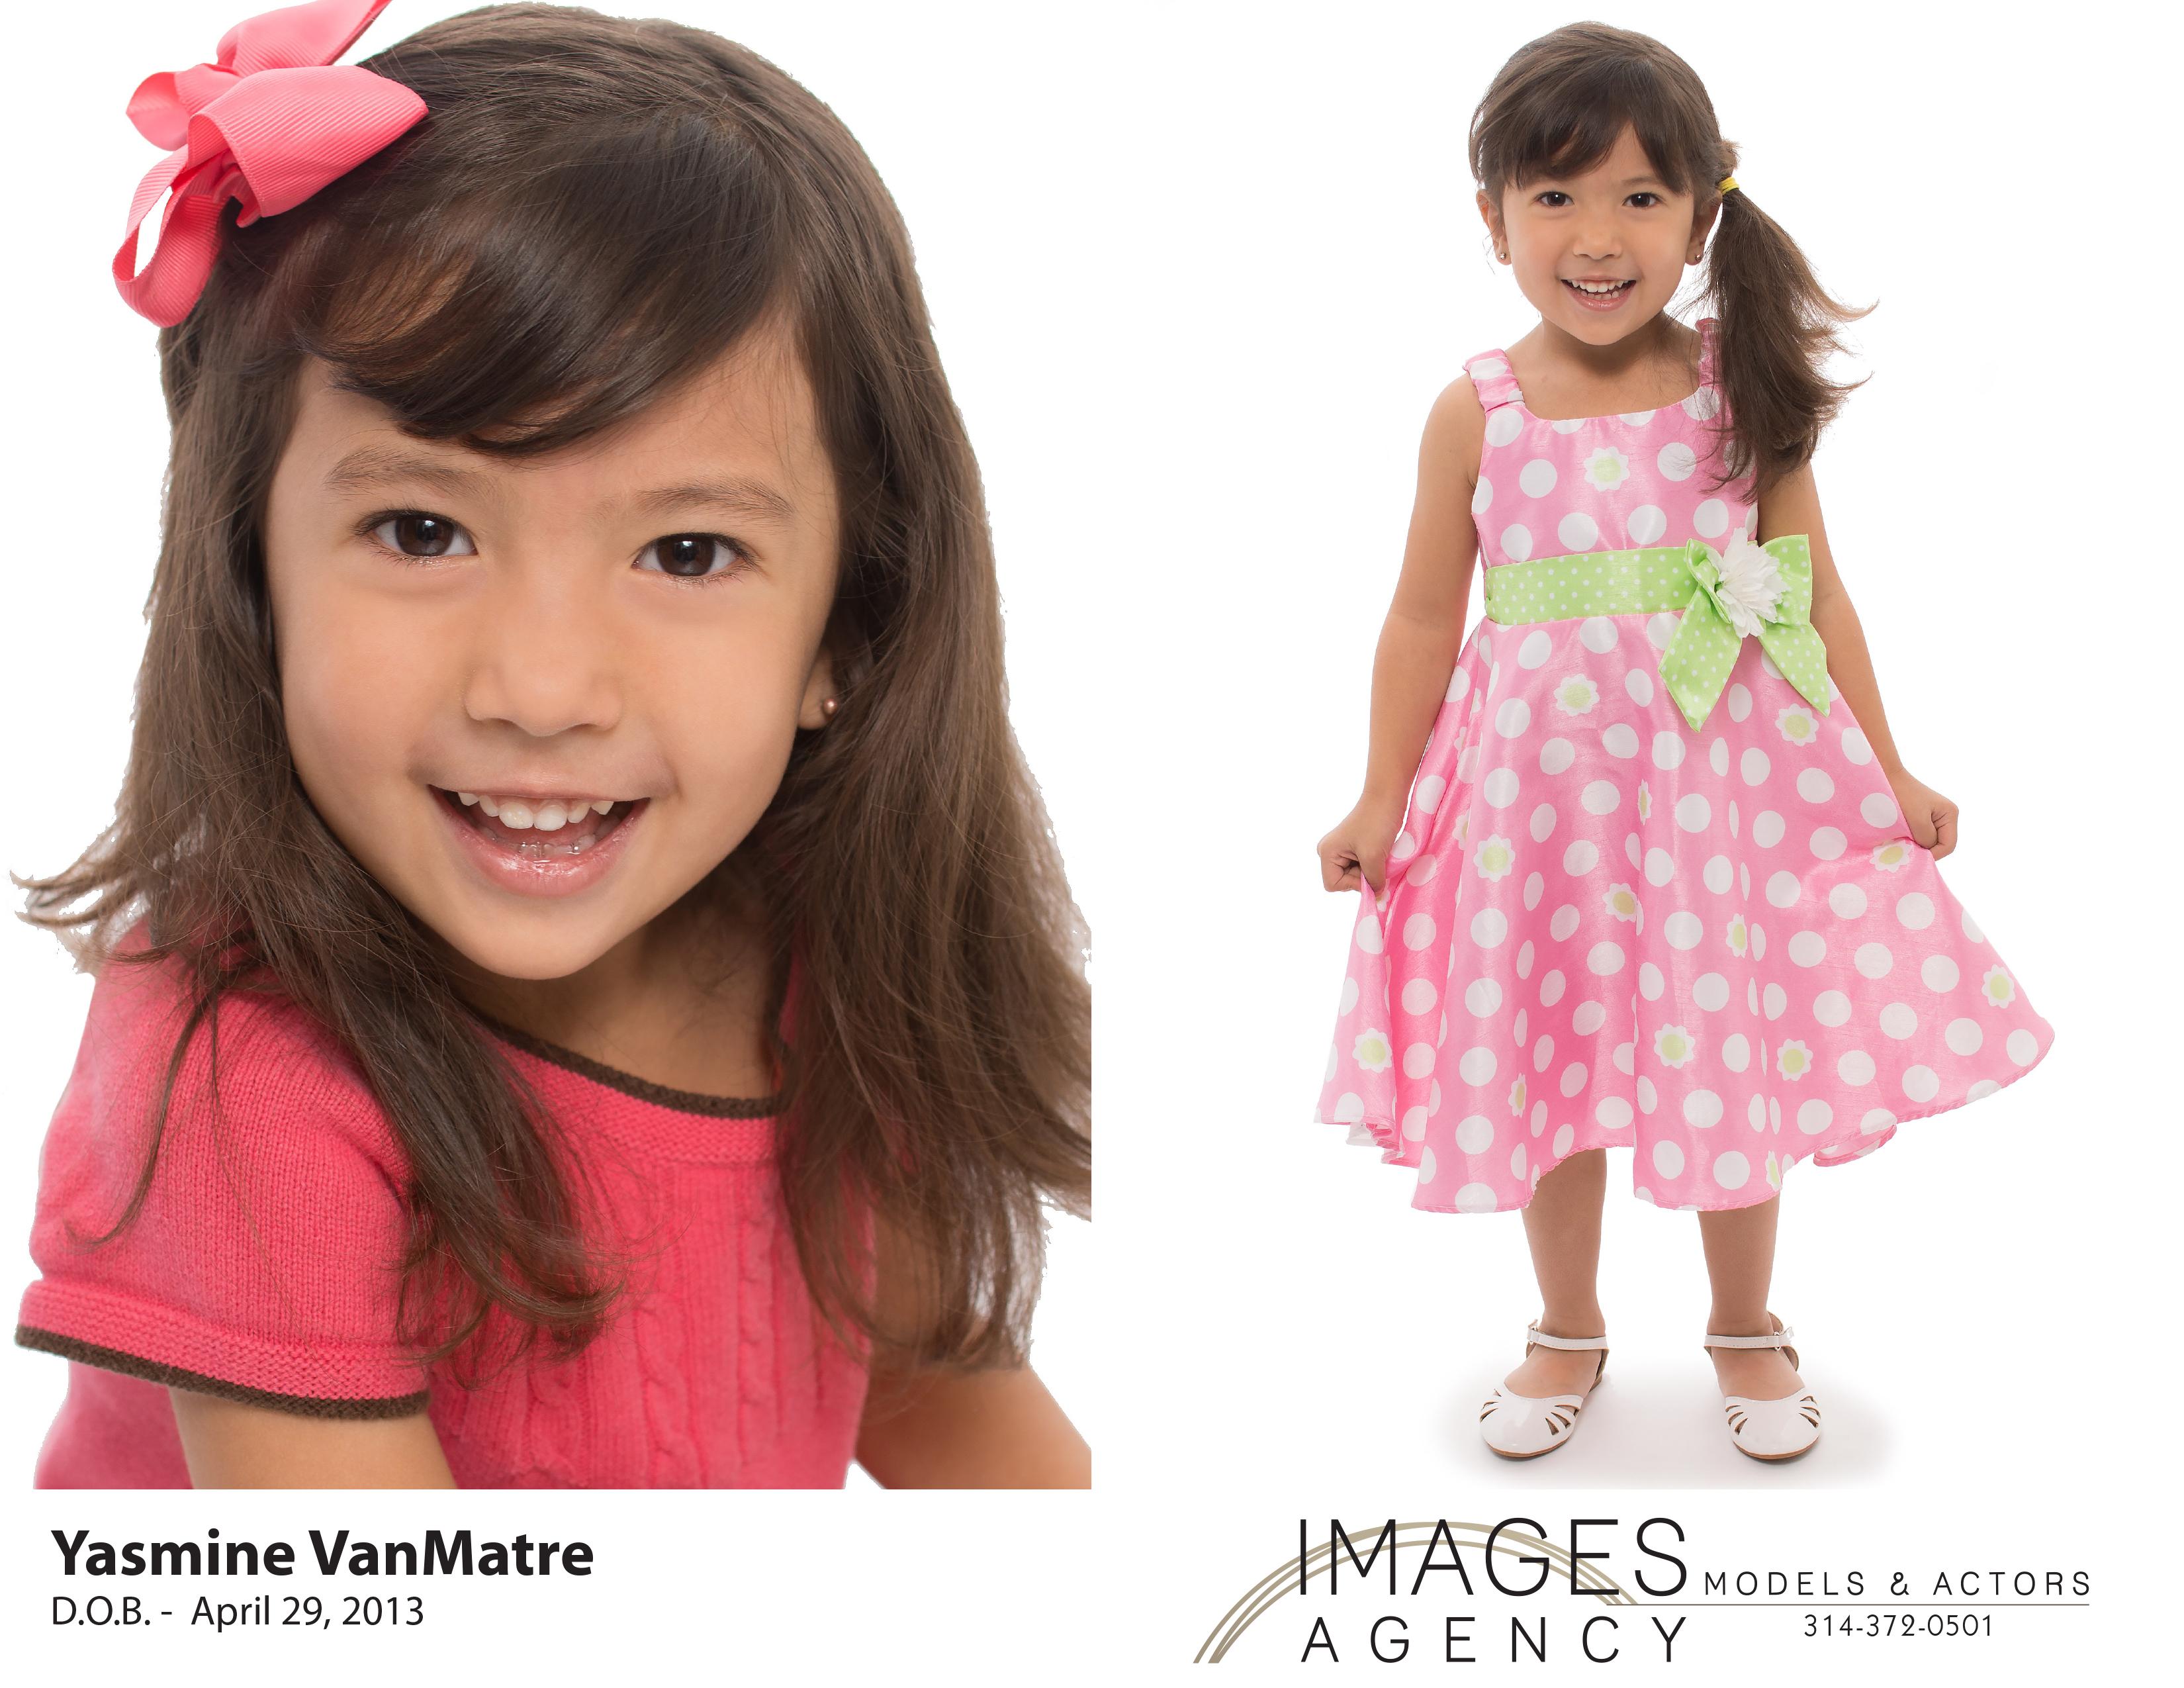 Yasmine VanMatre